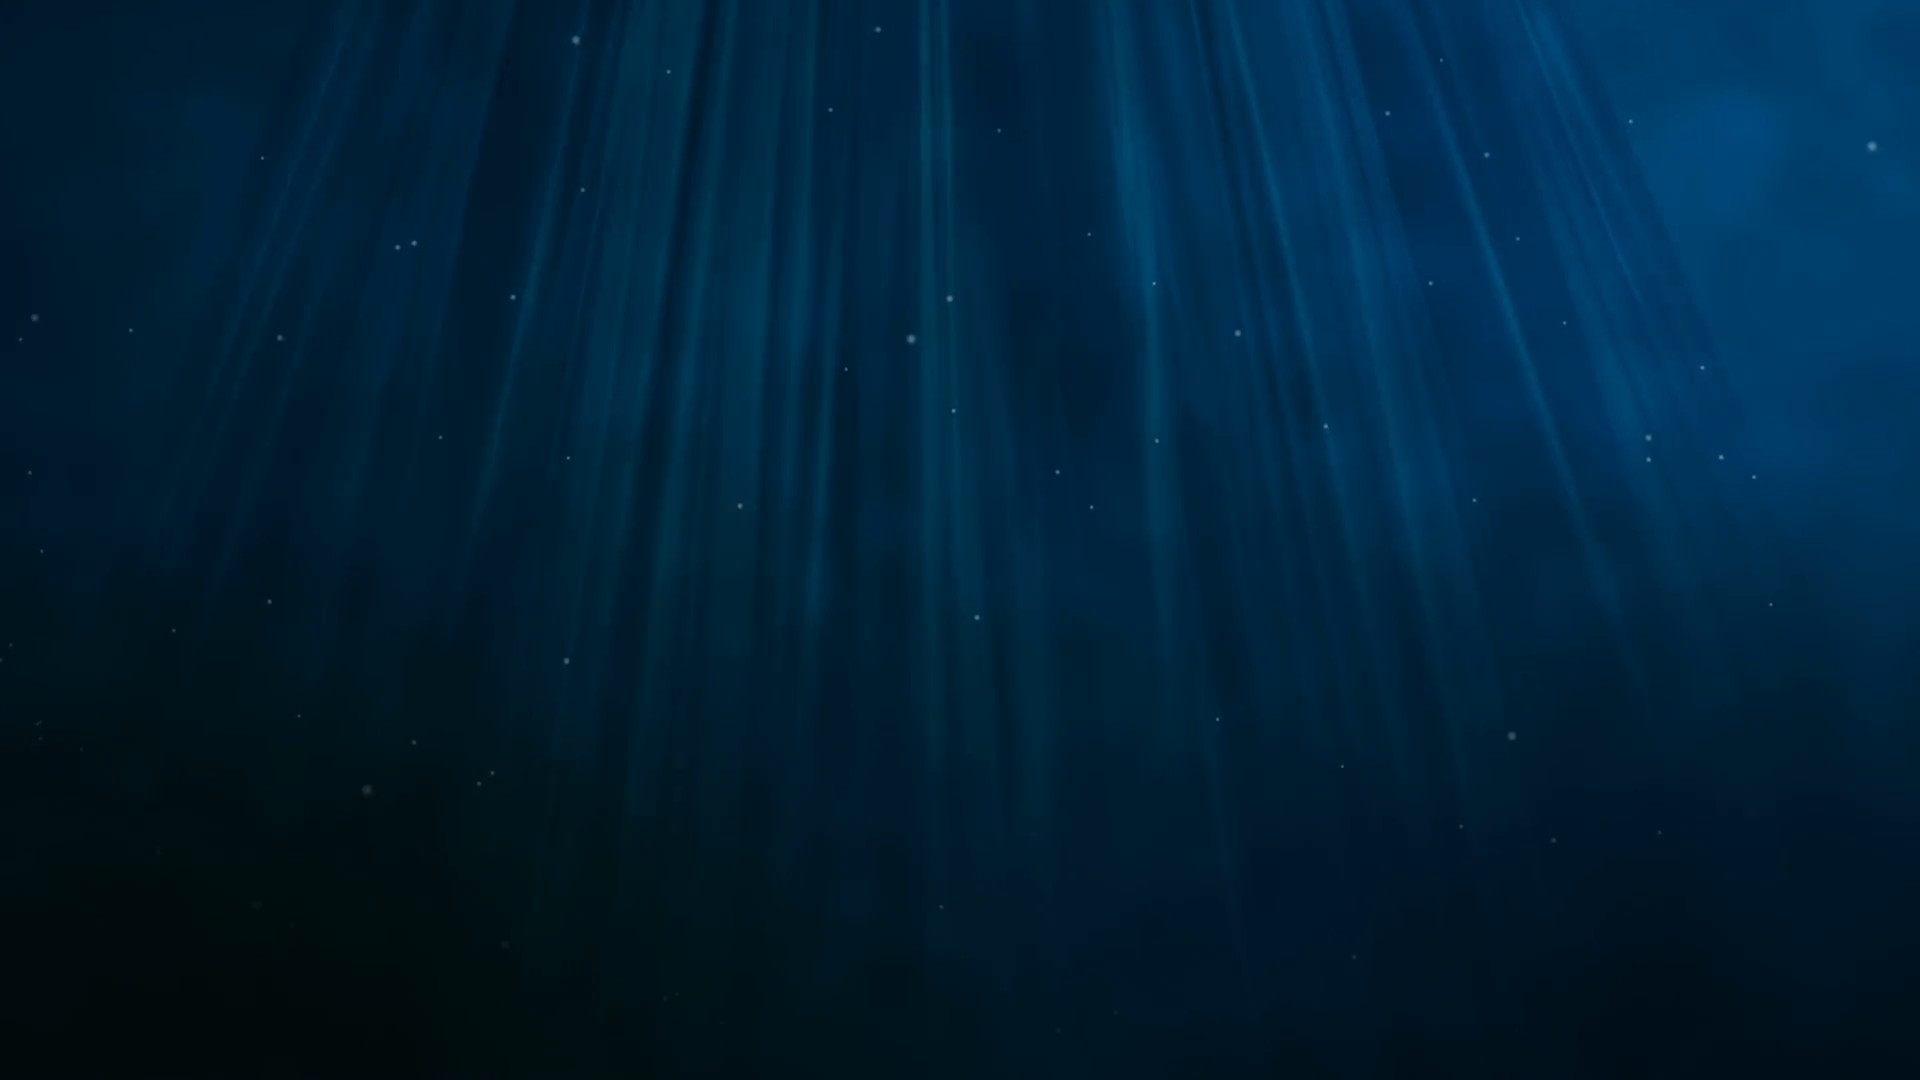 Deep Blue Background 47 Images